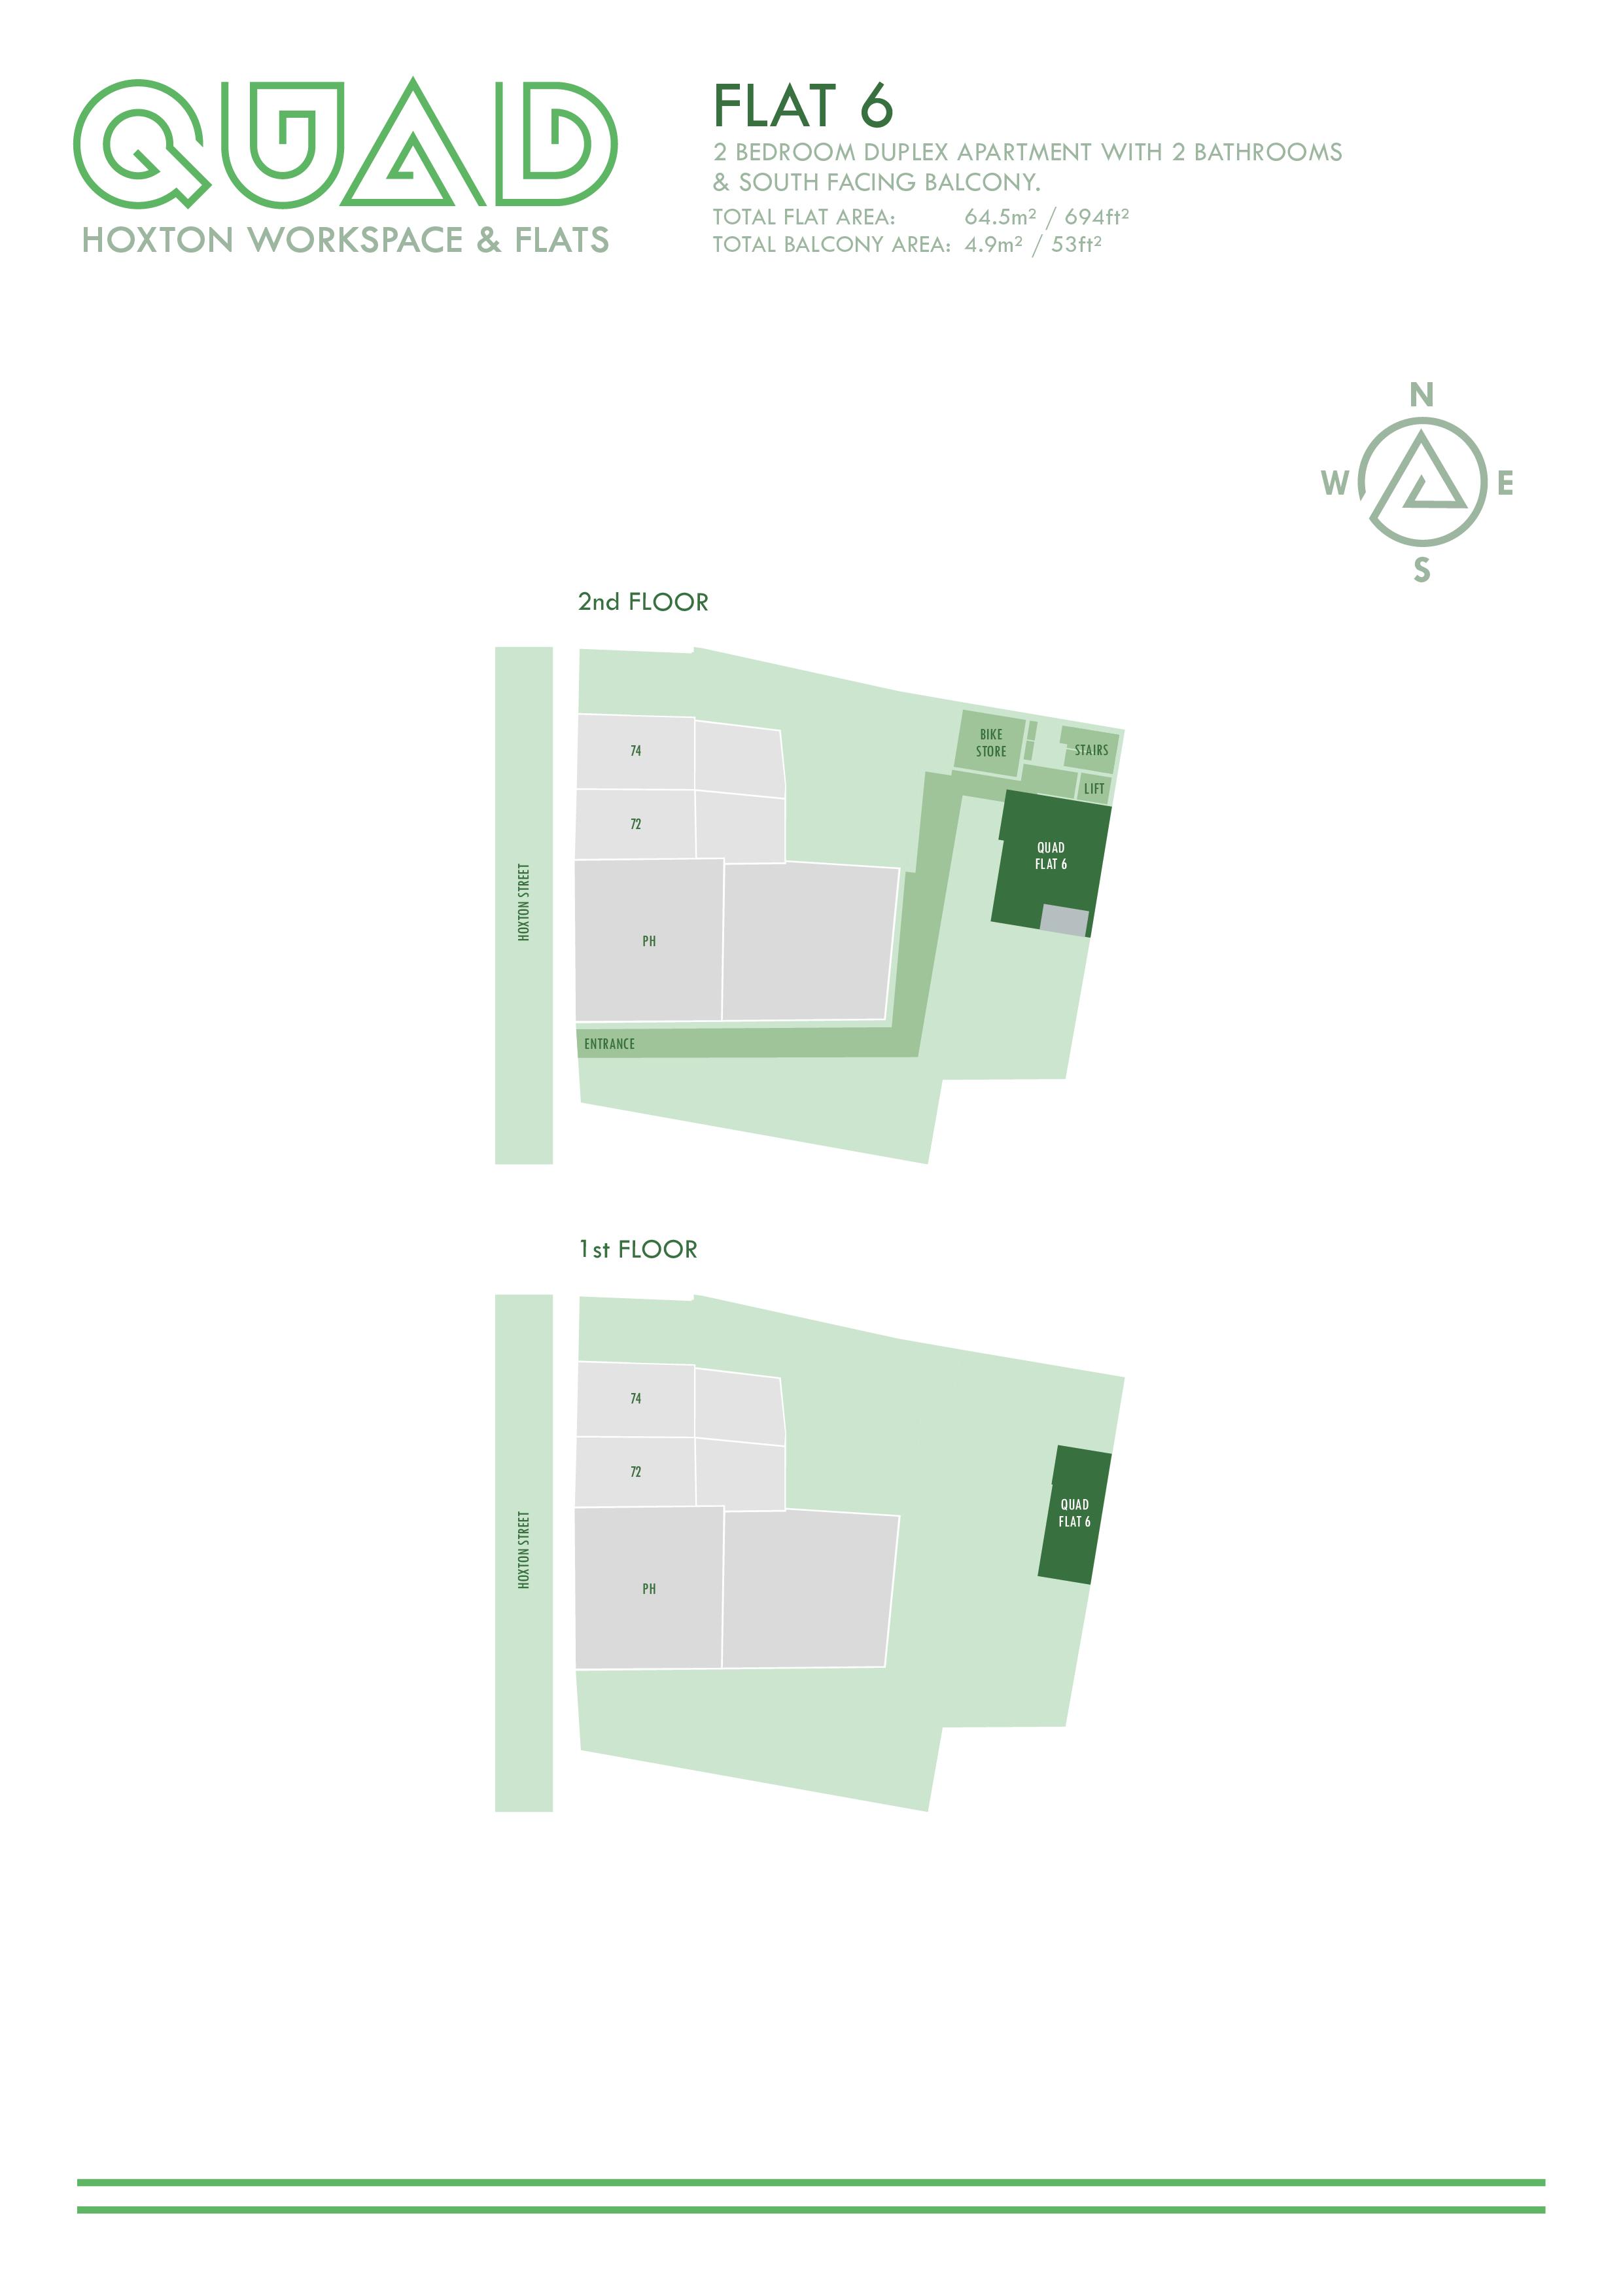 DCP Hoxton Floorplans5-14.png